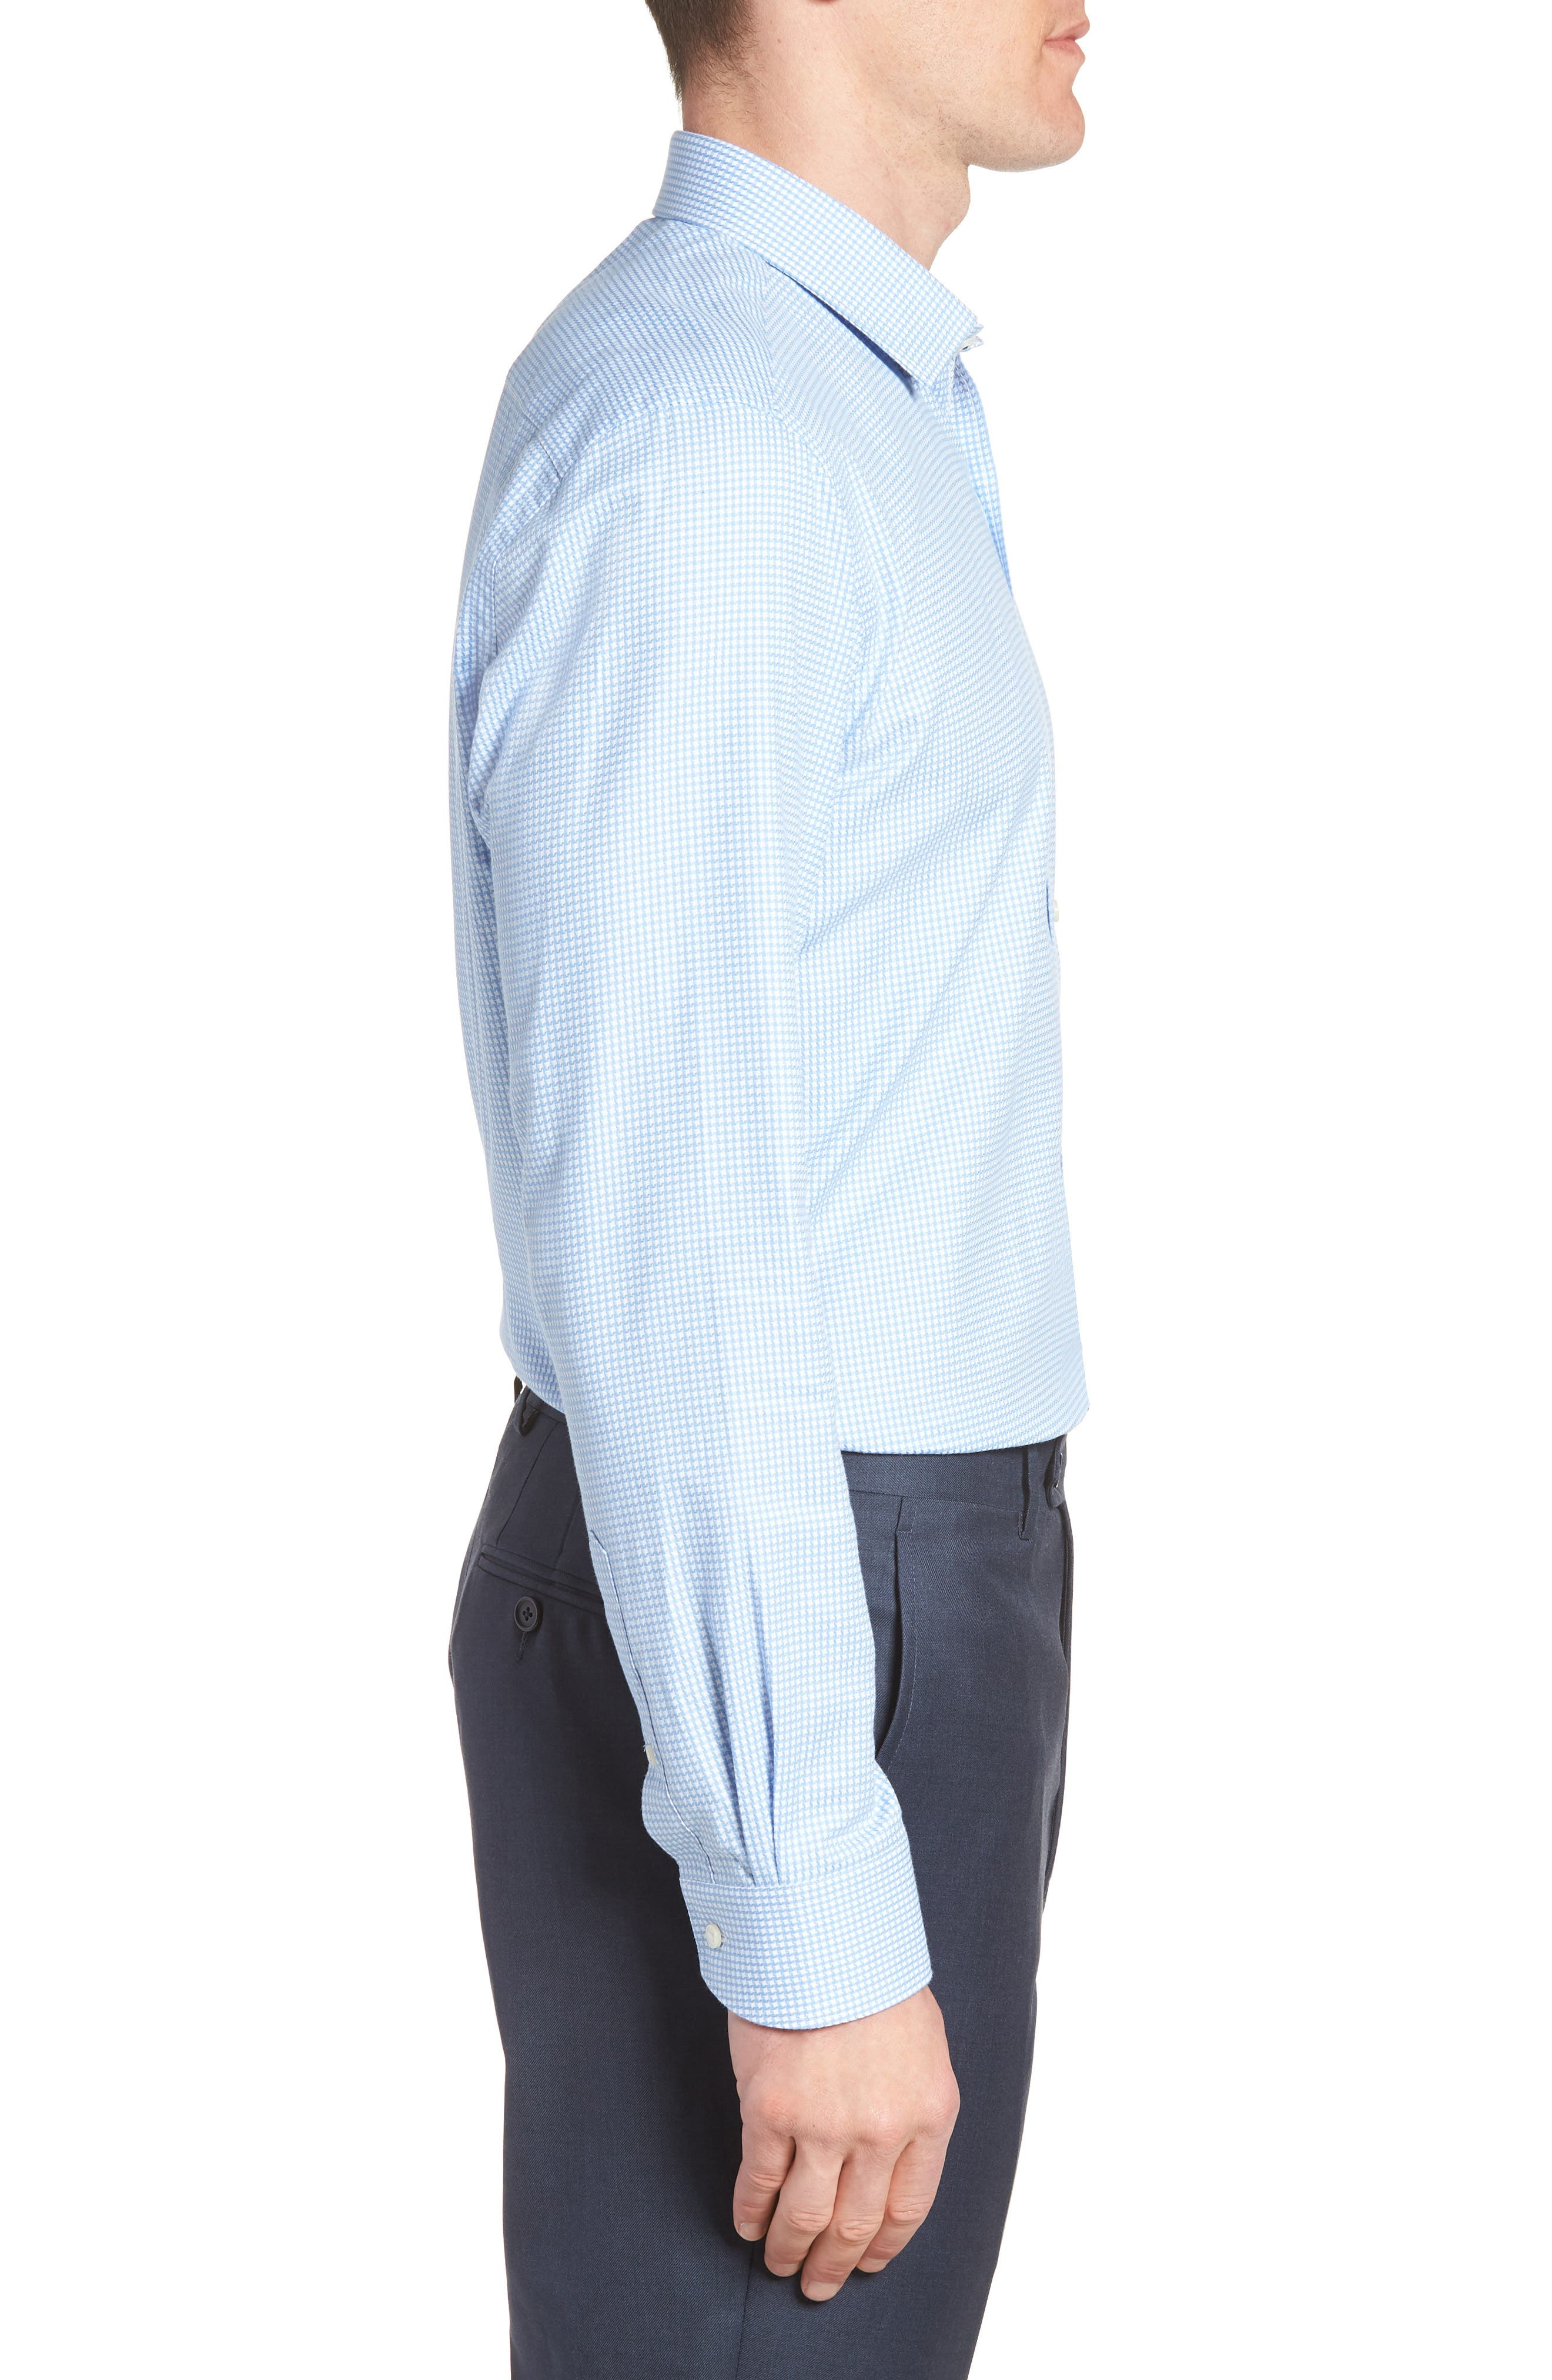 Jaiden Trim Fit Houndstooth Dress Shirt,                             Alternate thumbnail 4, color,                             Light Blue